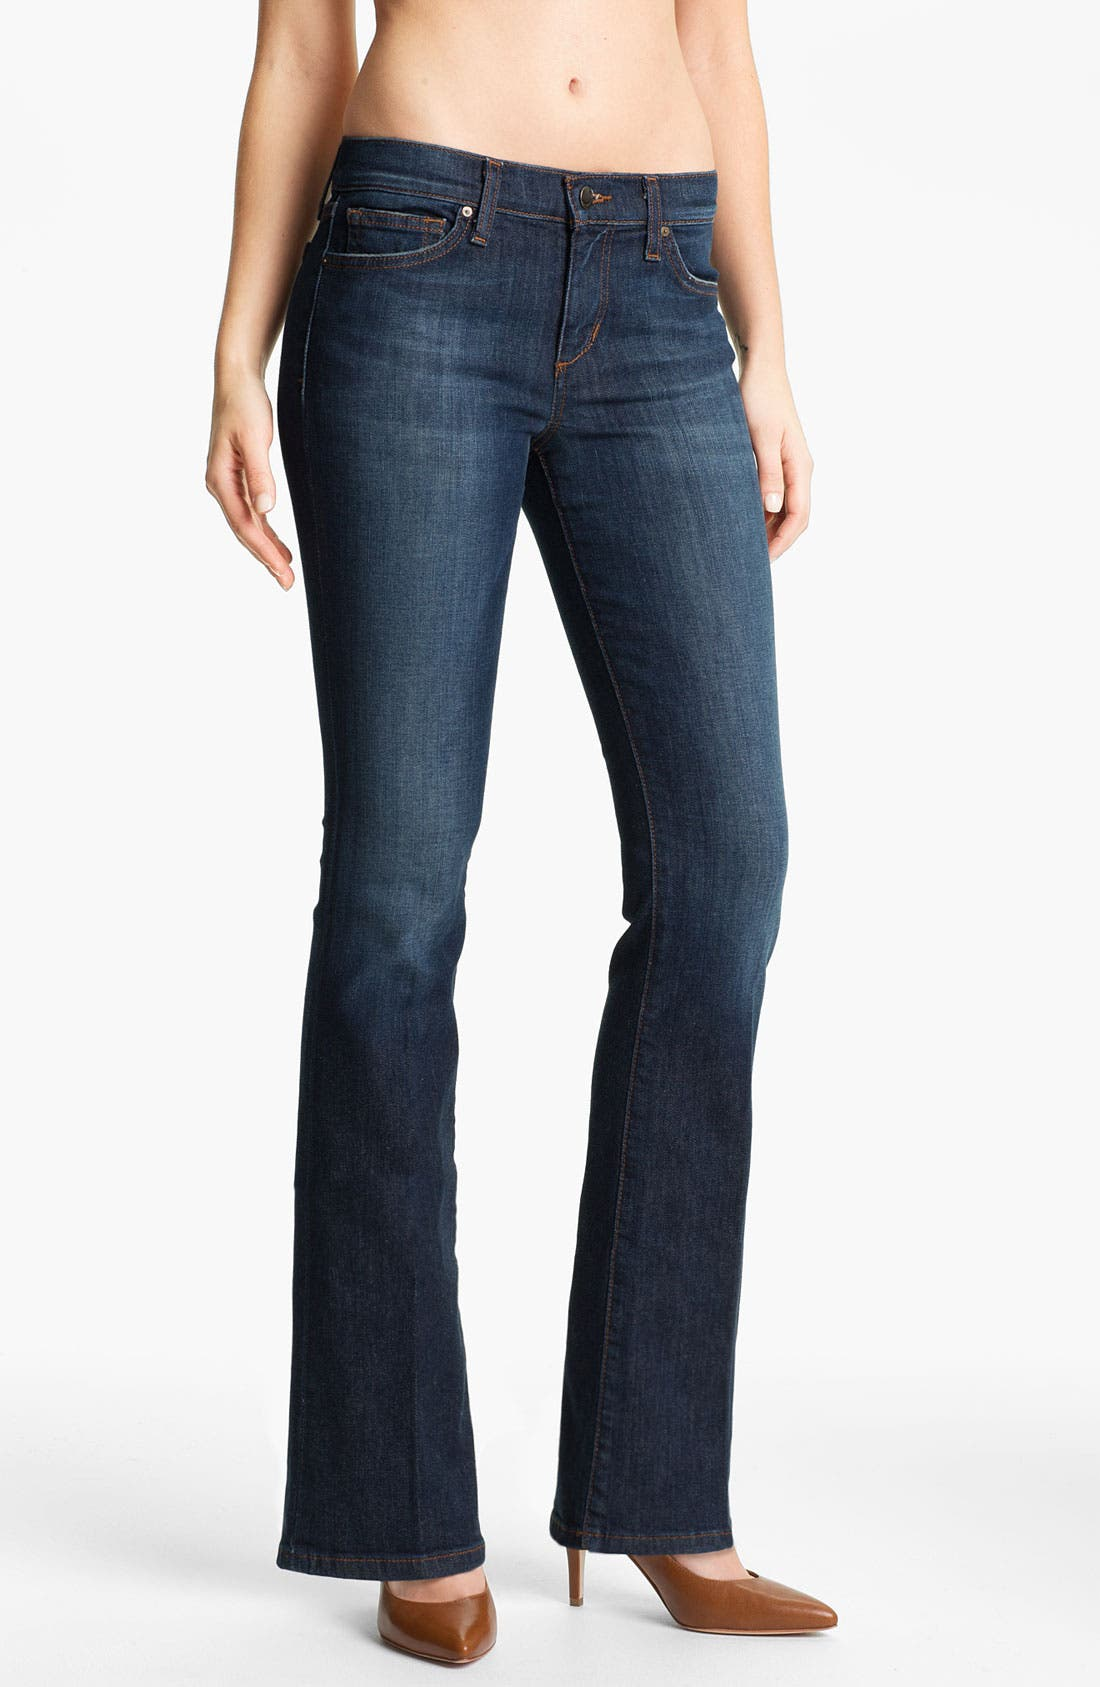 Alternate Image 1 Selected - Joe's 'Provocateur' Bootcut Stretch Jeans (Quinn)